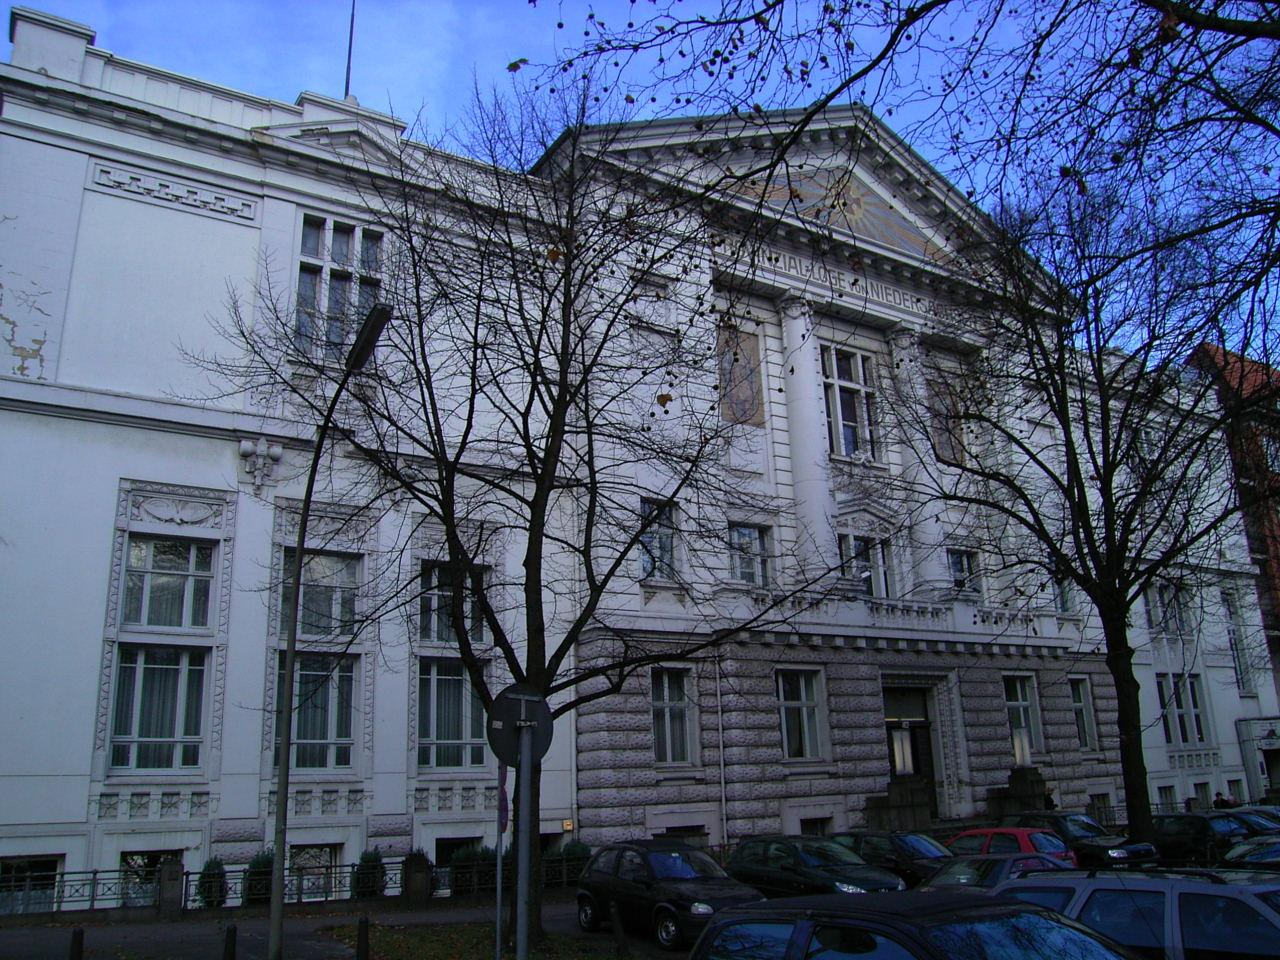 Logenhaus5.jpg